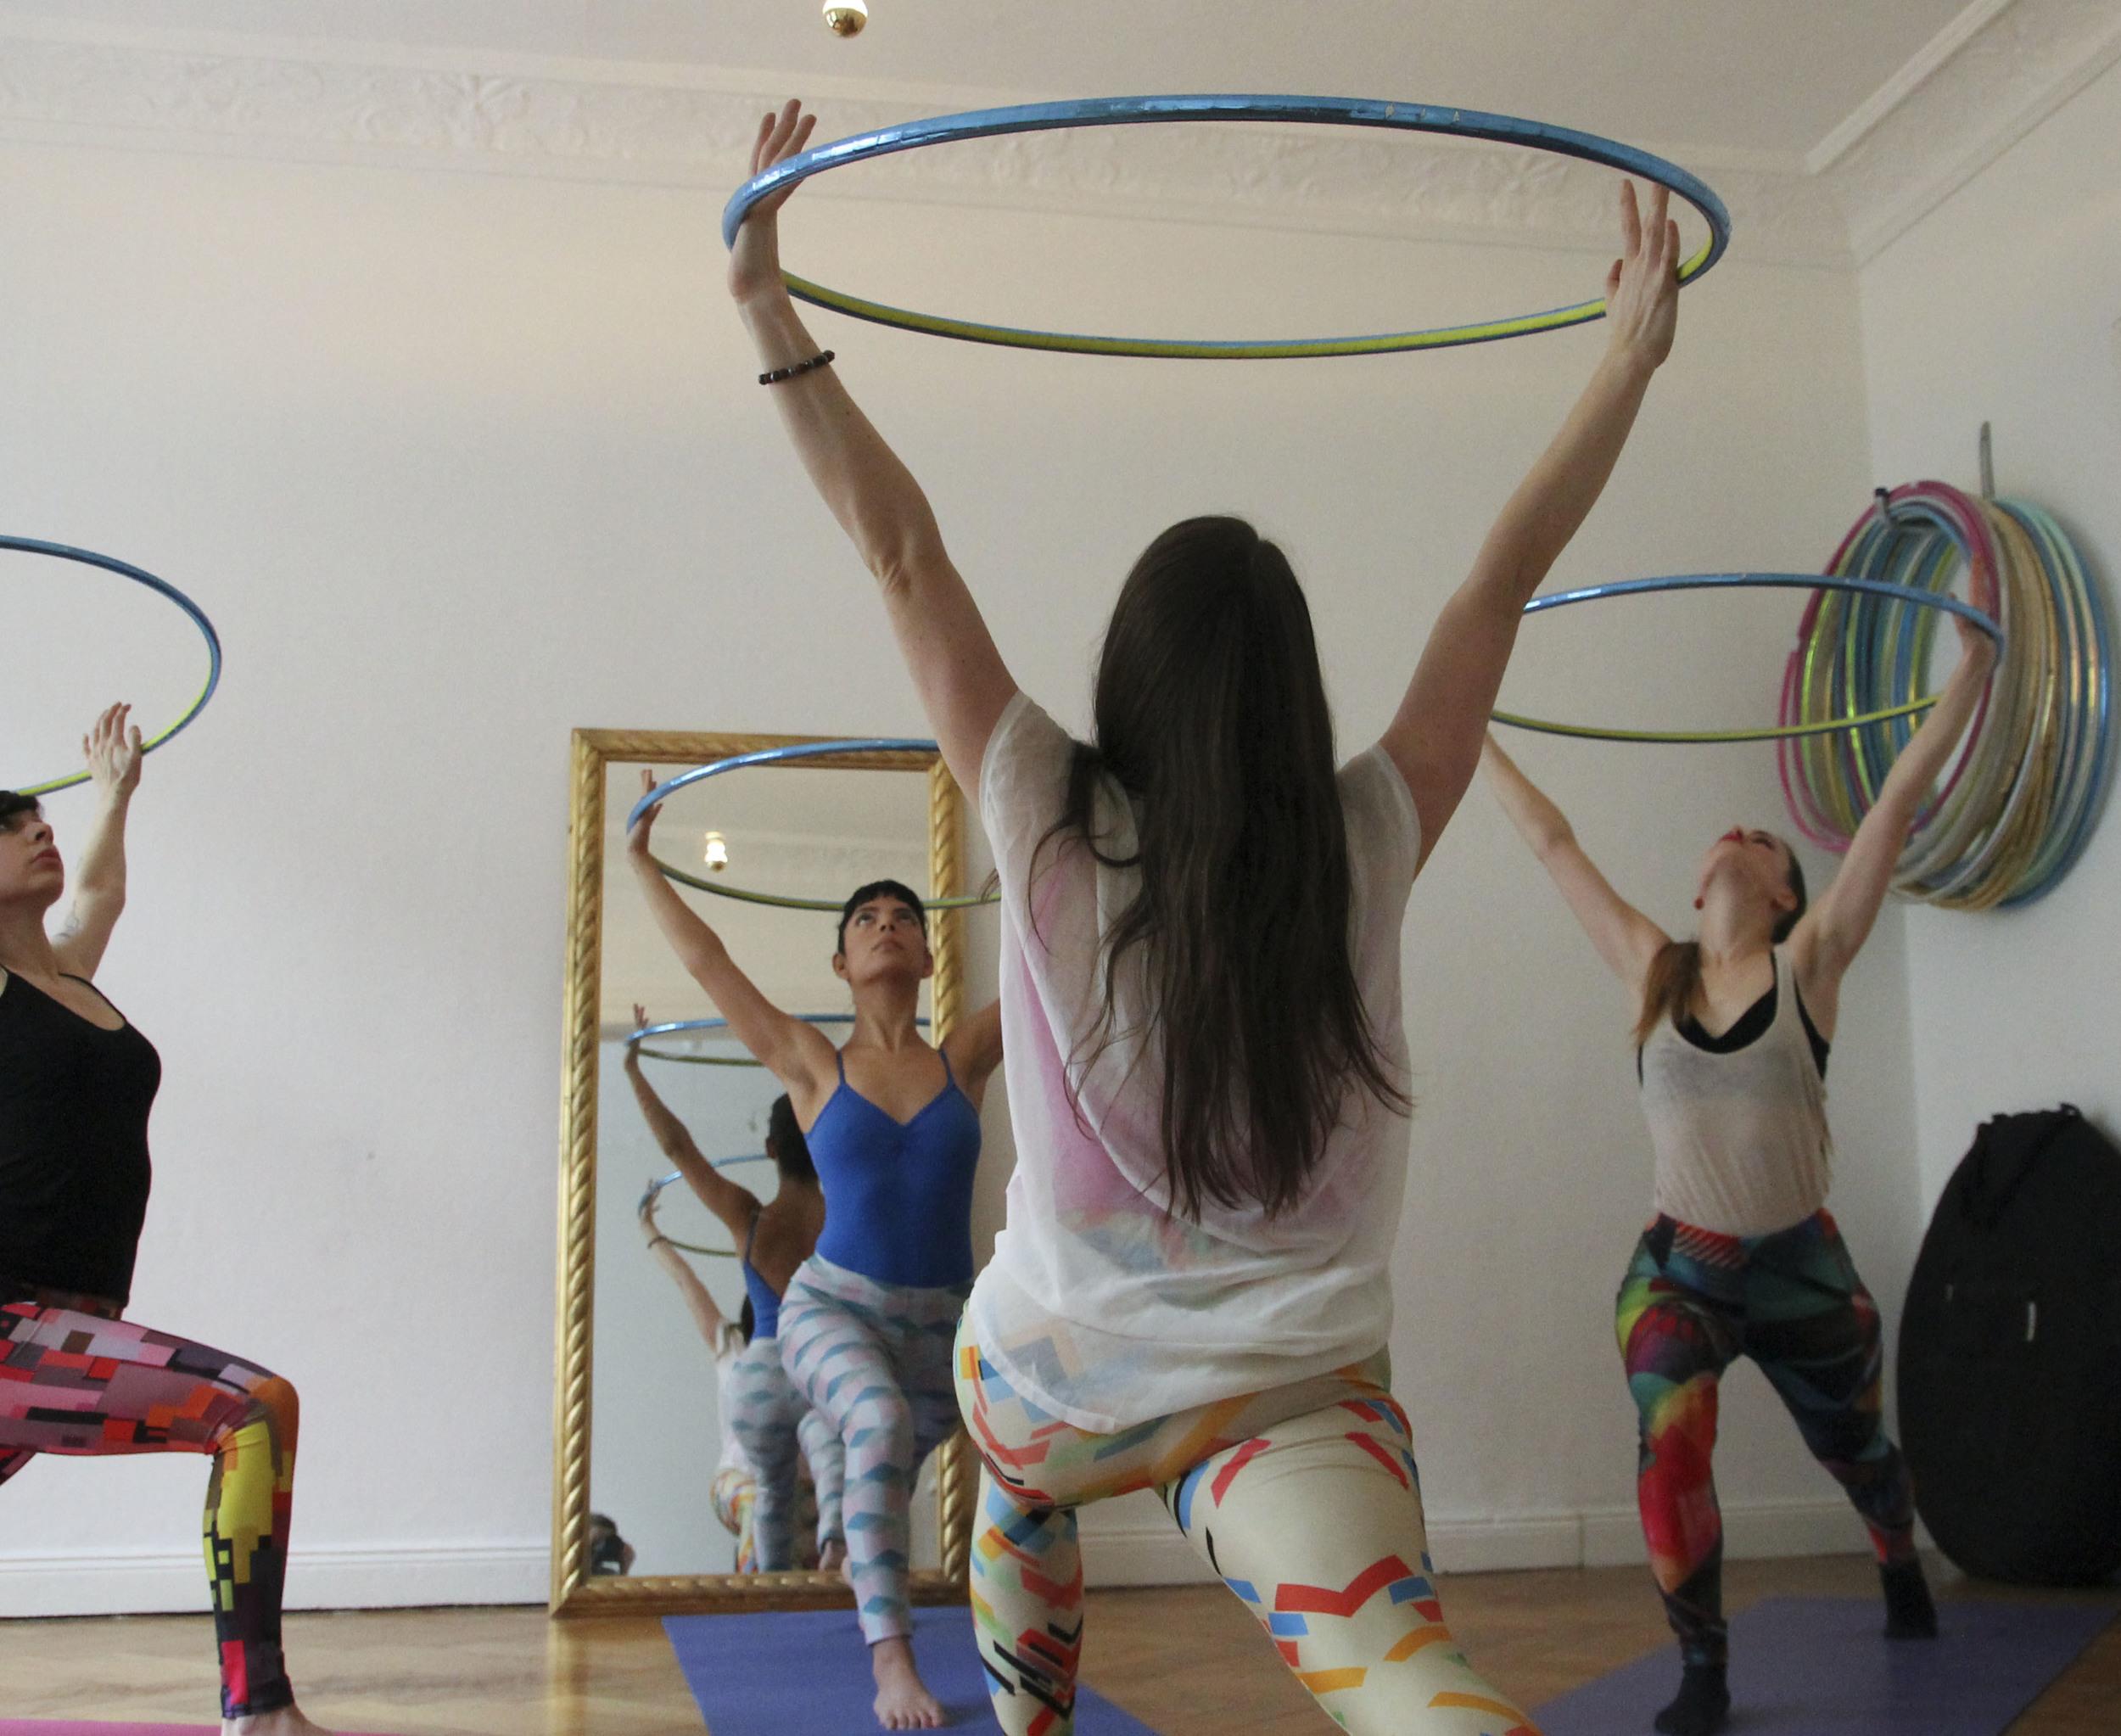 hoop yoga rebecca halls berlin1263.jpg